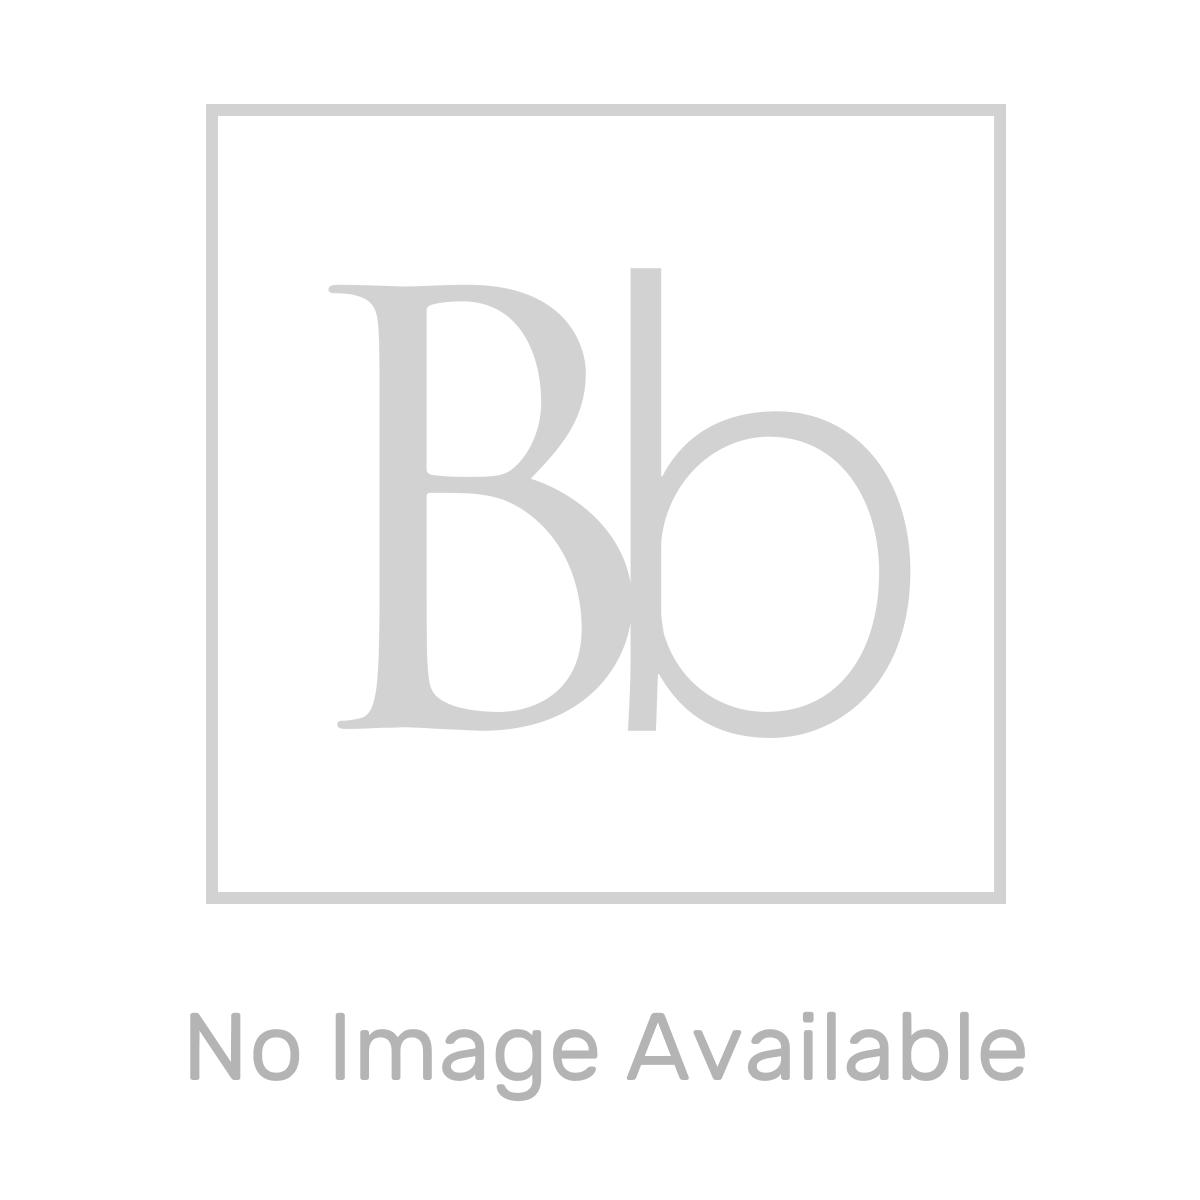 Aquadart Black Slate Shower Tray 1400 x 800